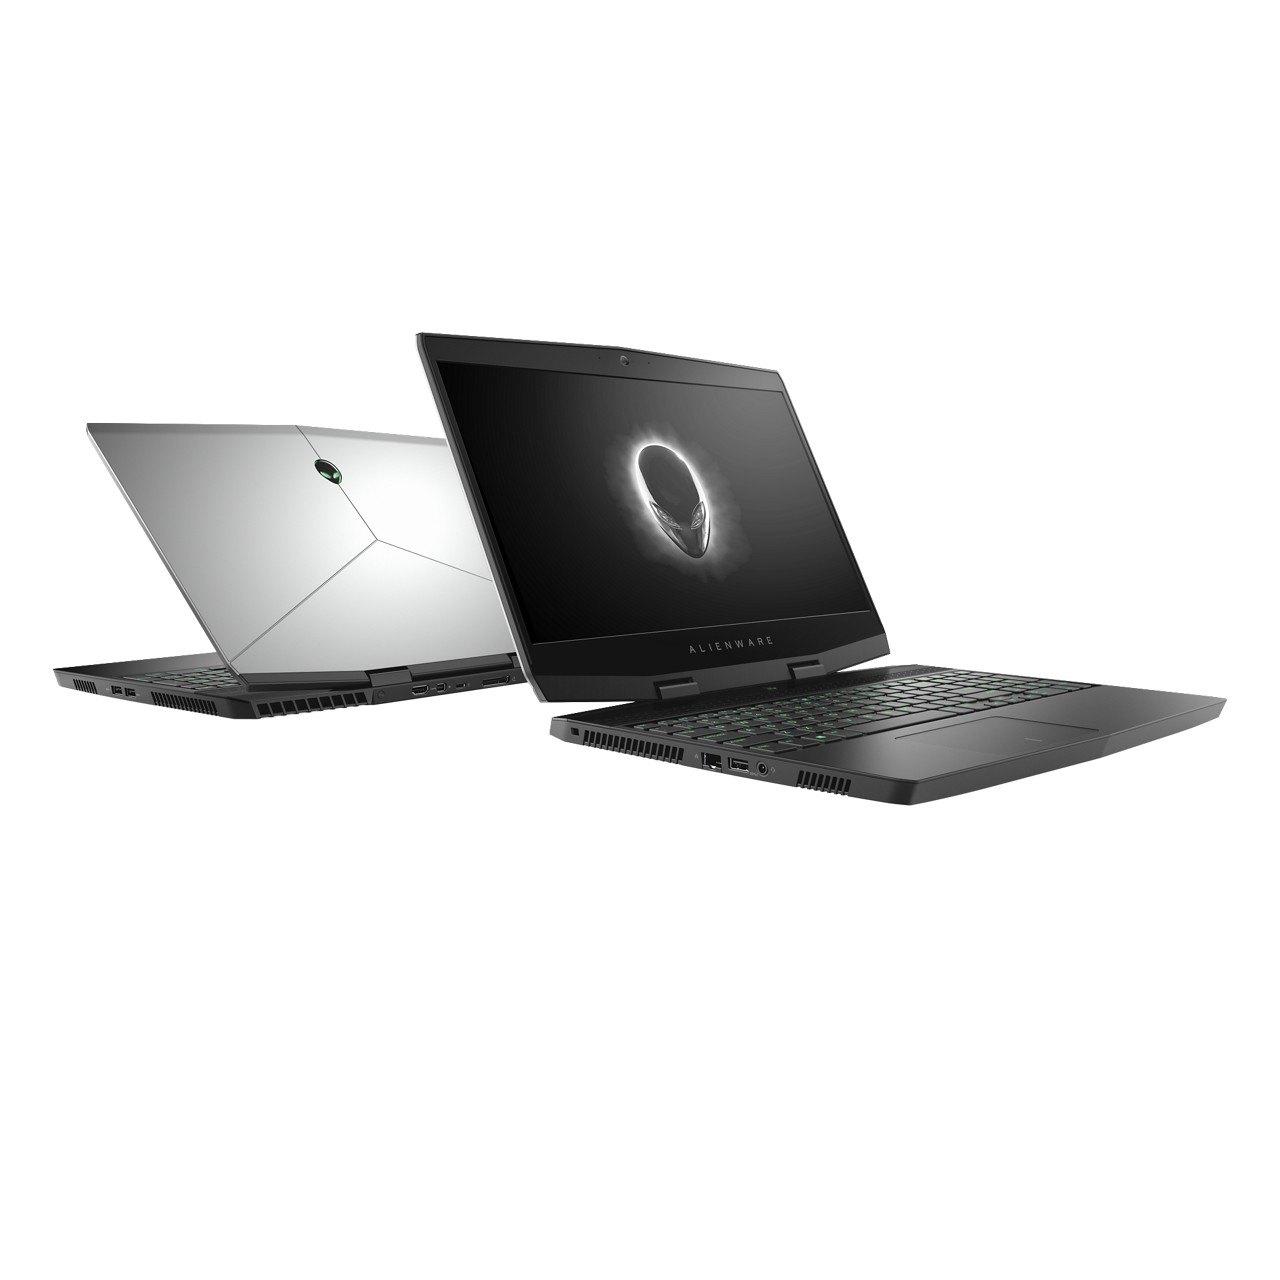 "Alienware m15 Gaming Laptop 15.6"" Intel i7-8750H NVIDIA GTX 1060 256GB SSD + 1TB HDD 16GB RAM: $1399.99 + FS + $419.70 back in Rakuten Super Points"